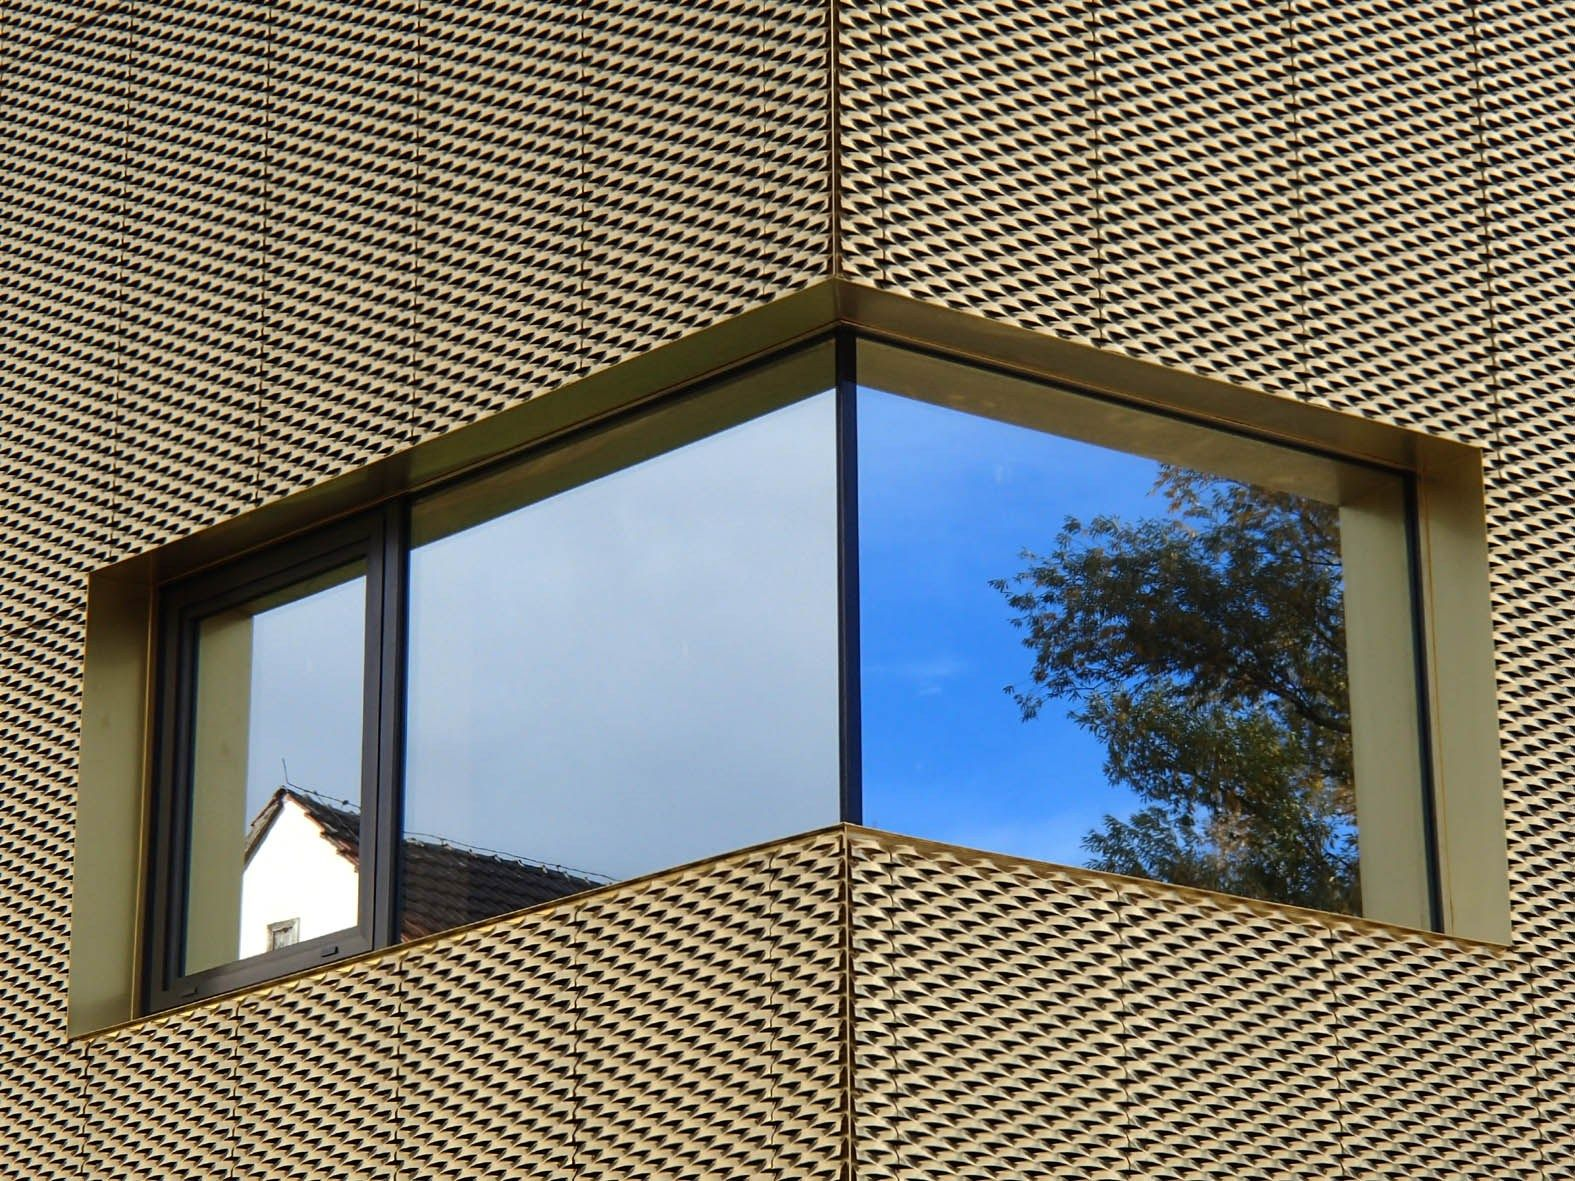 streckmetall f r fassadenverkleidung tecu design mesh by kme architectural blech pinterest. Black Bedroom Furniture Sets. Home Design Ideas